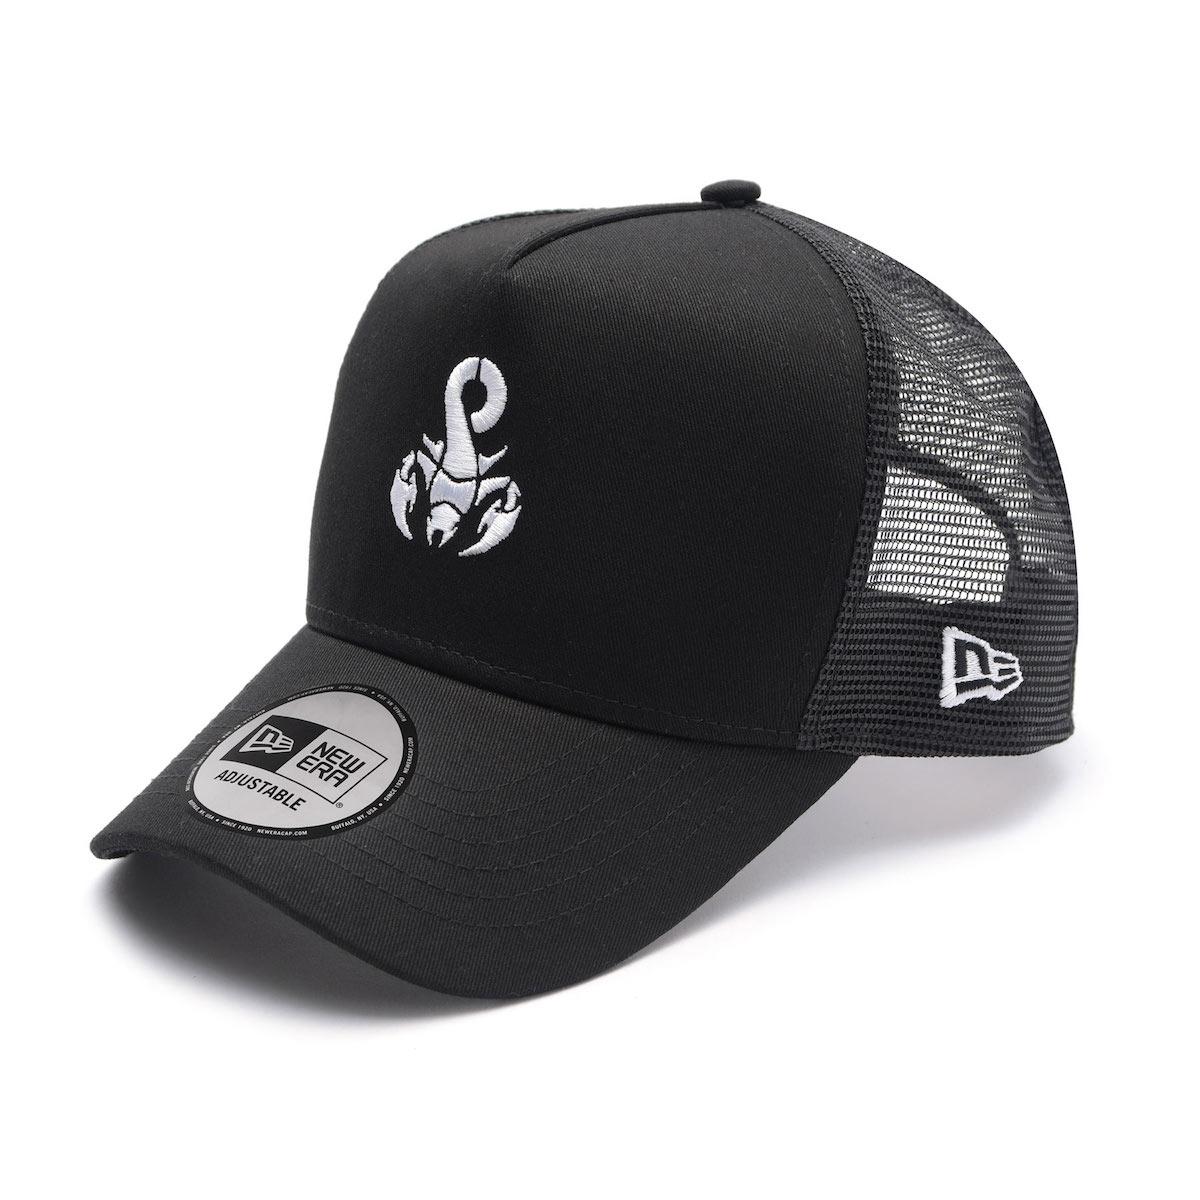 SOPHNET. / NEW ERA SCORPION MESH CAP -Black